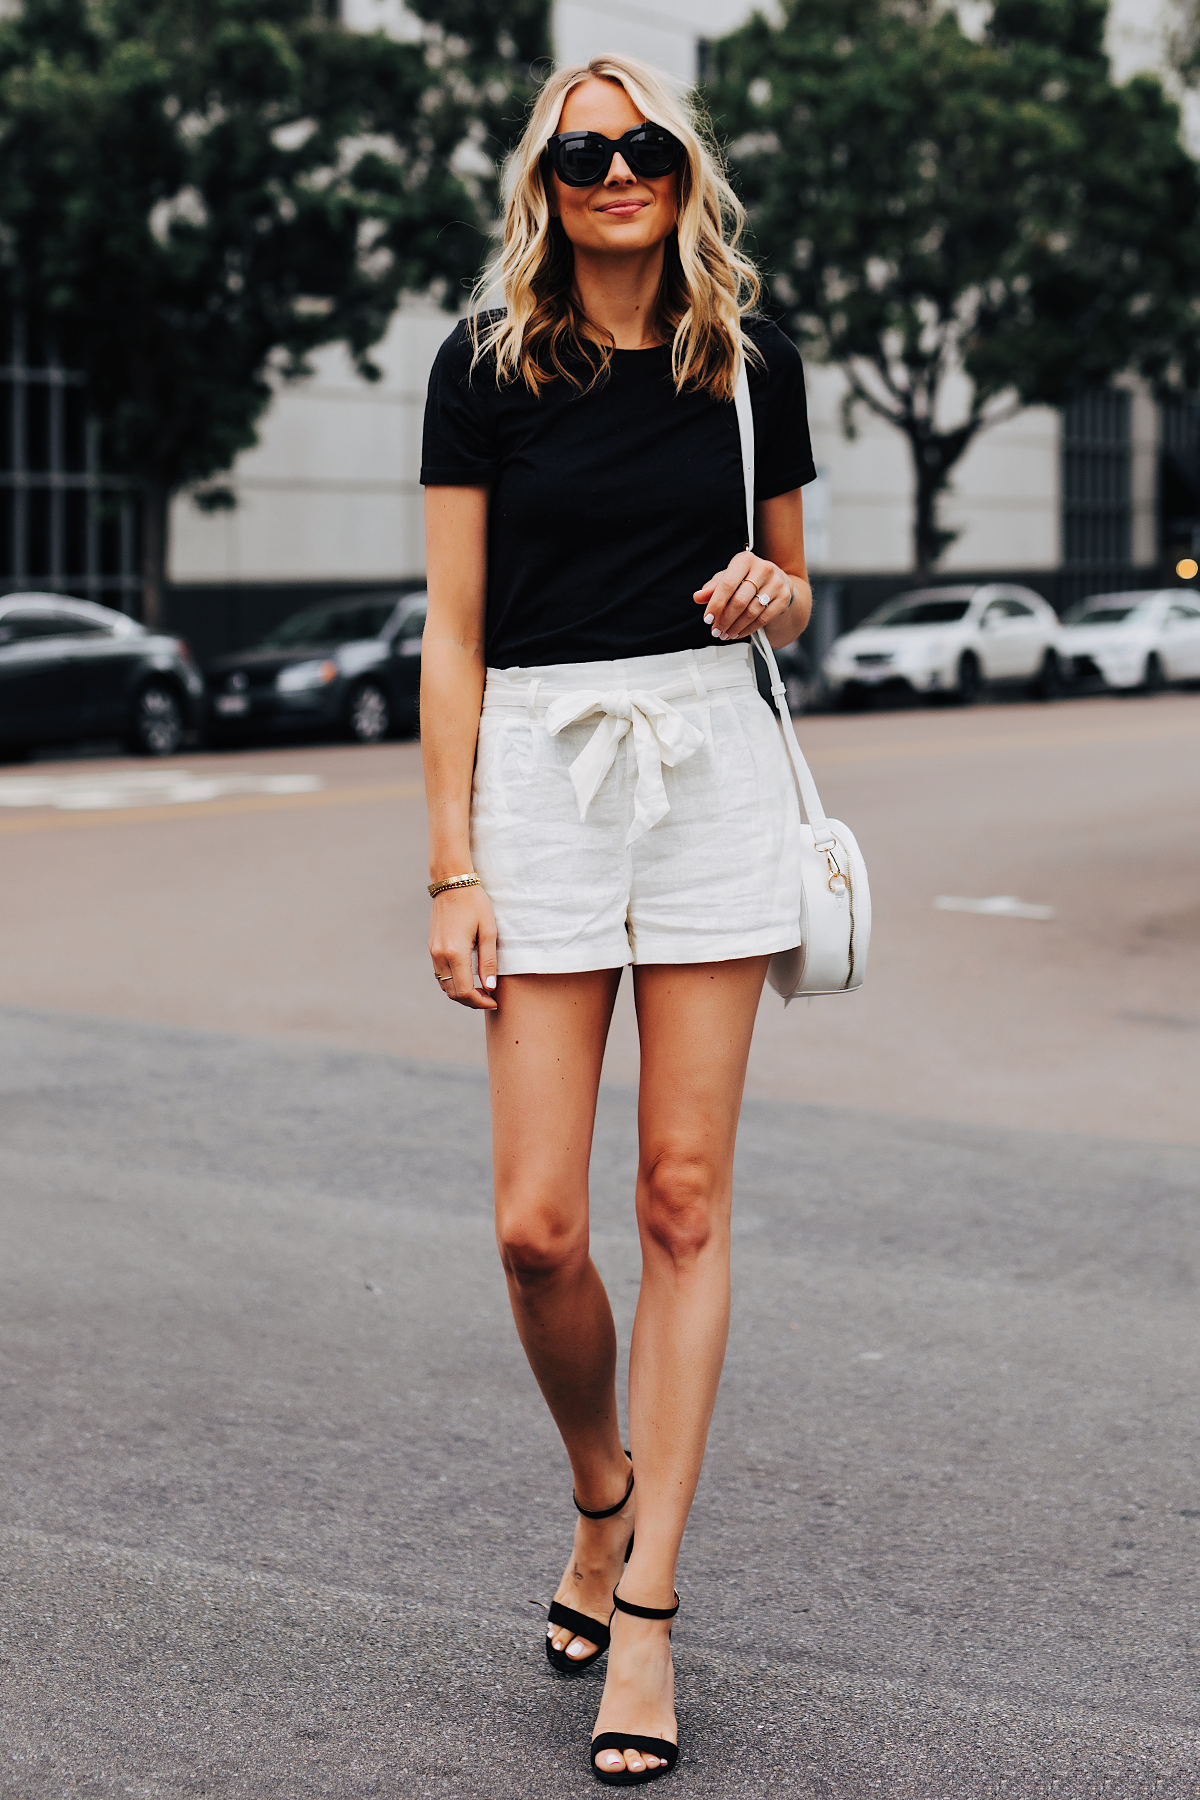 Fashion Jackson Wearing Black Tshirt White Tie Front Shorts Black Heeled Sandals 1